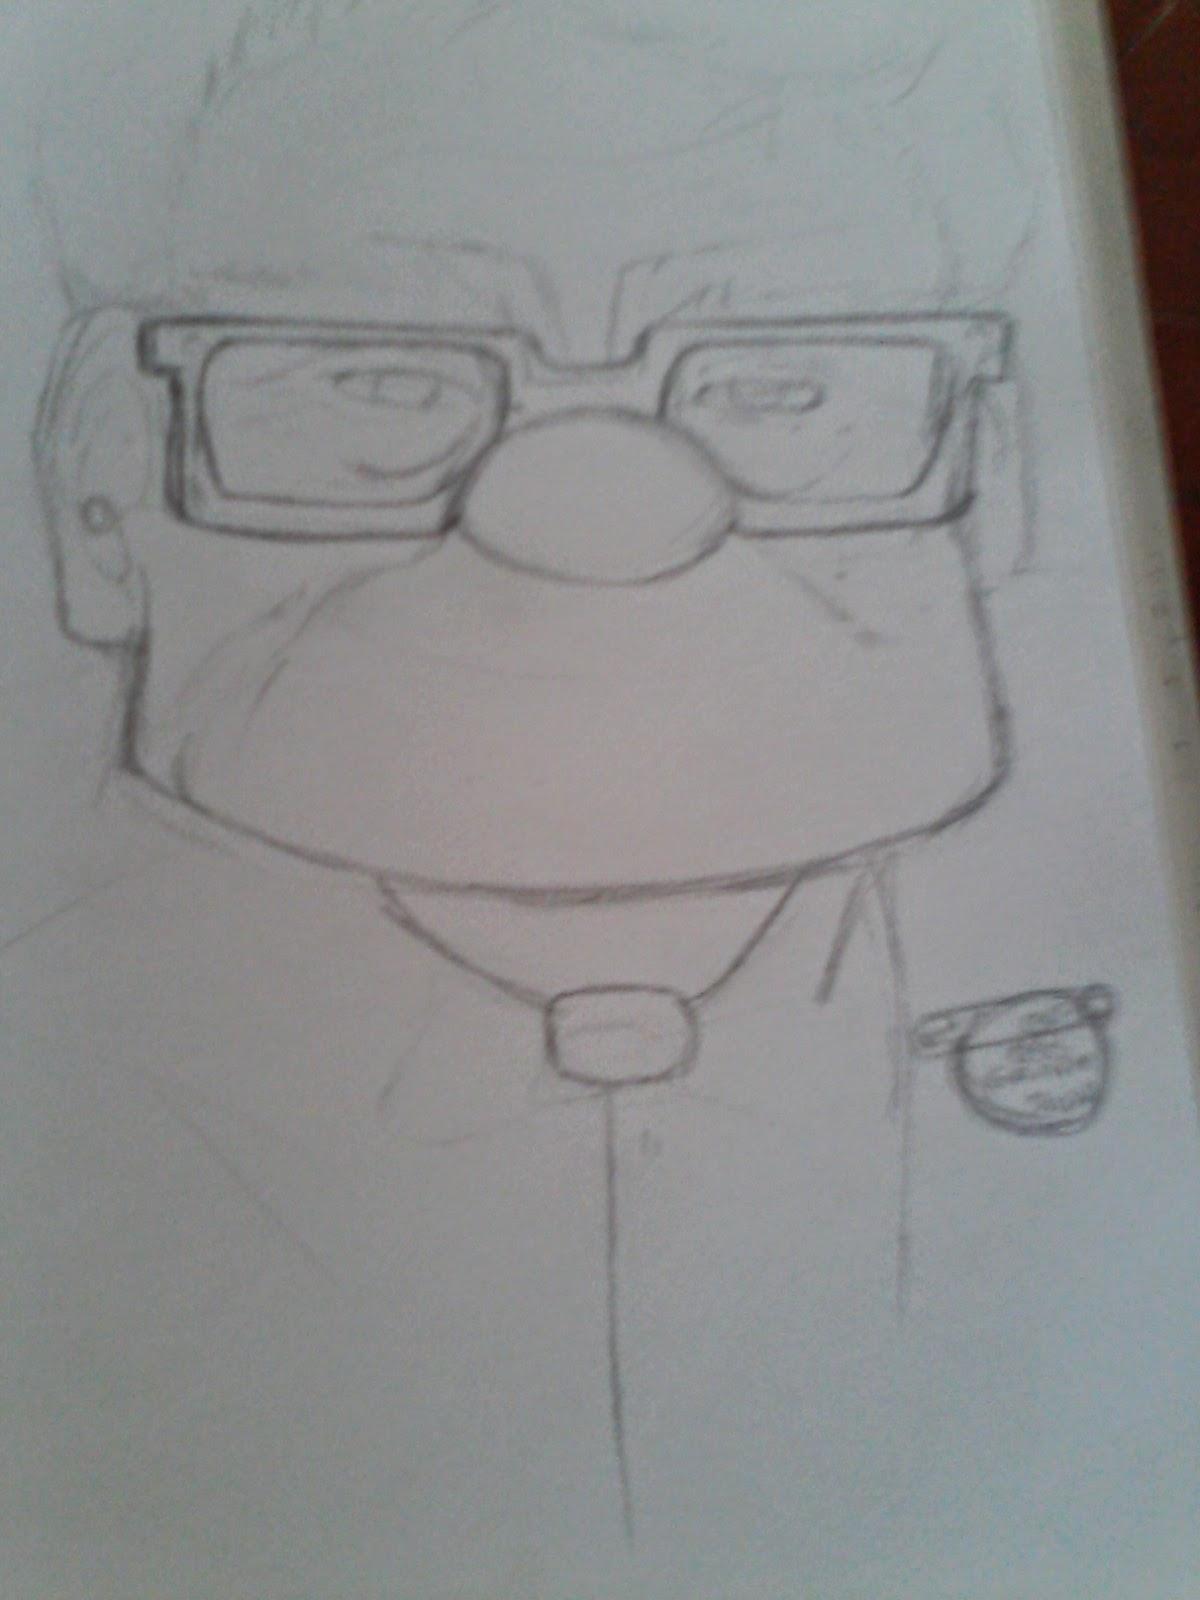 Carl/Up/Disney